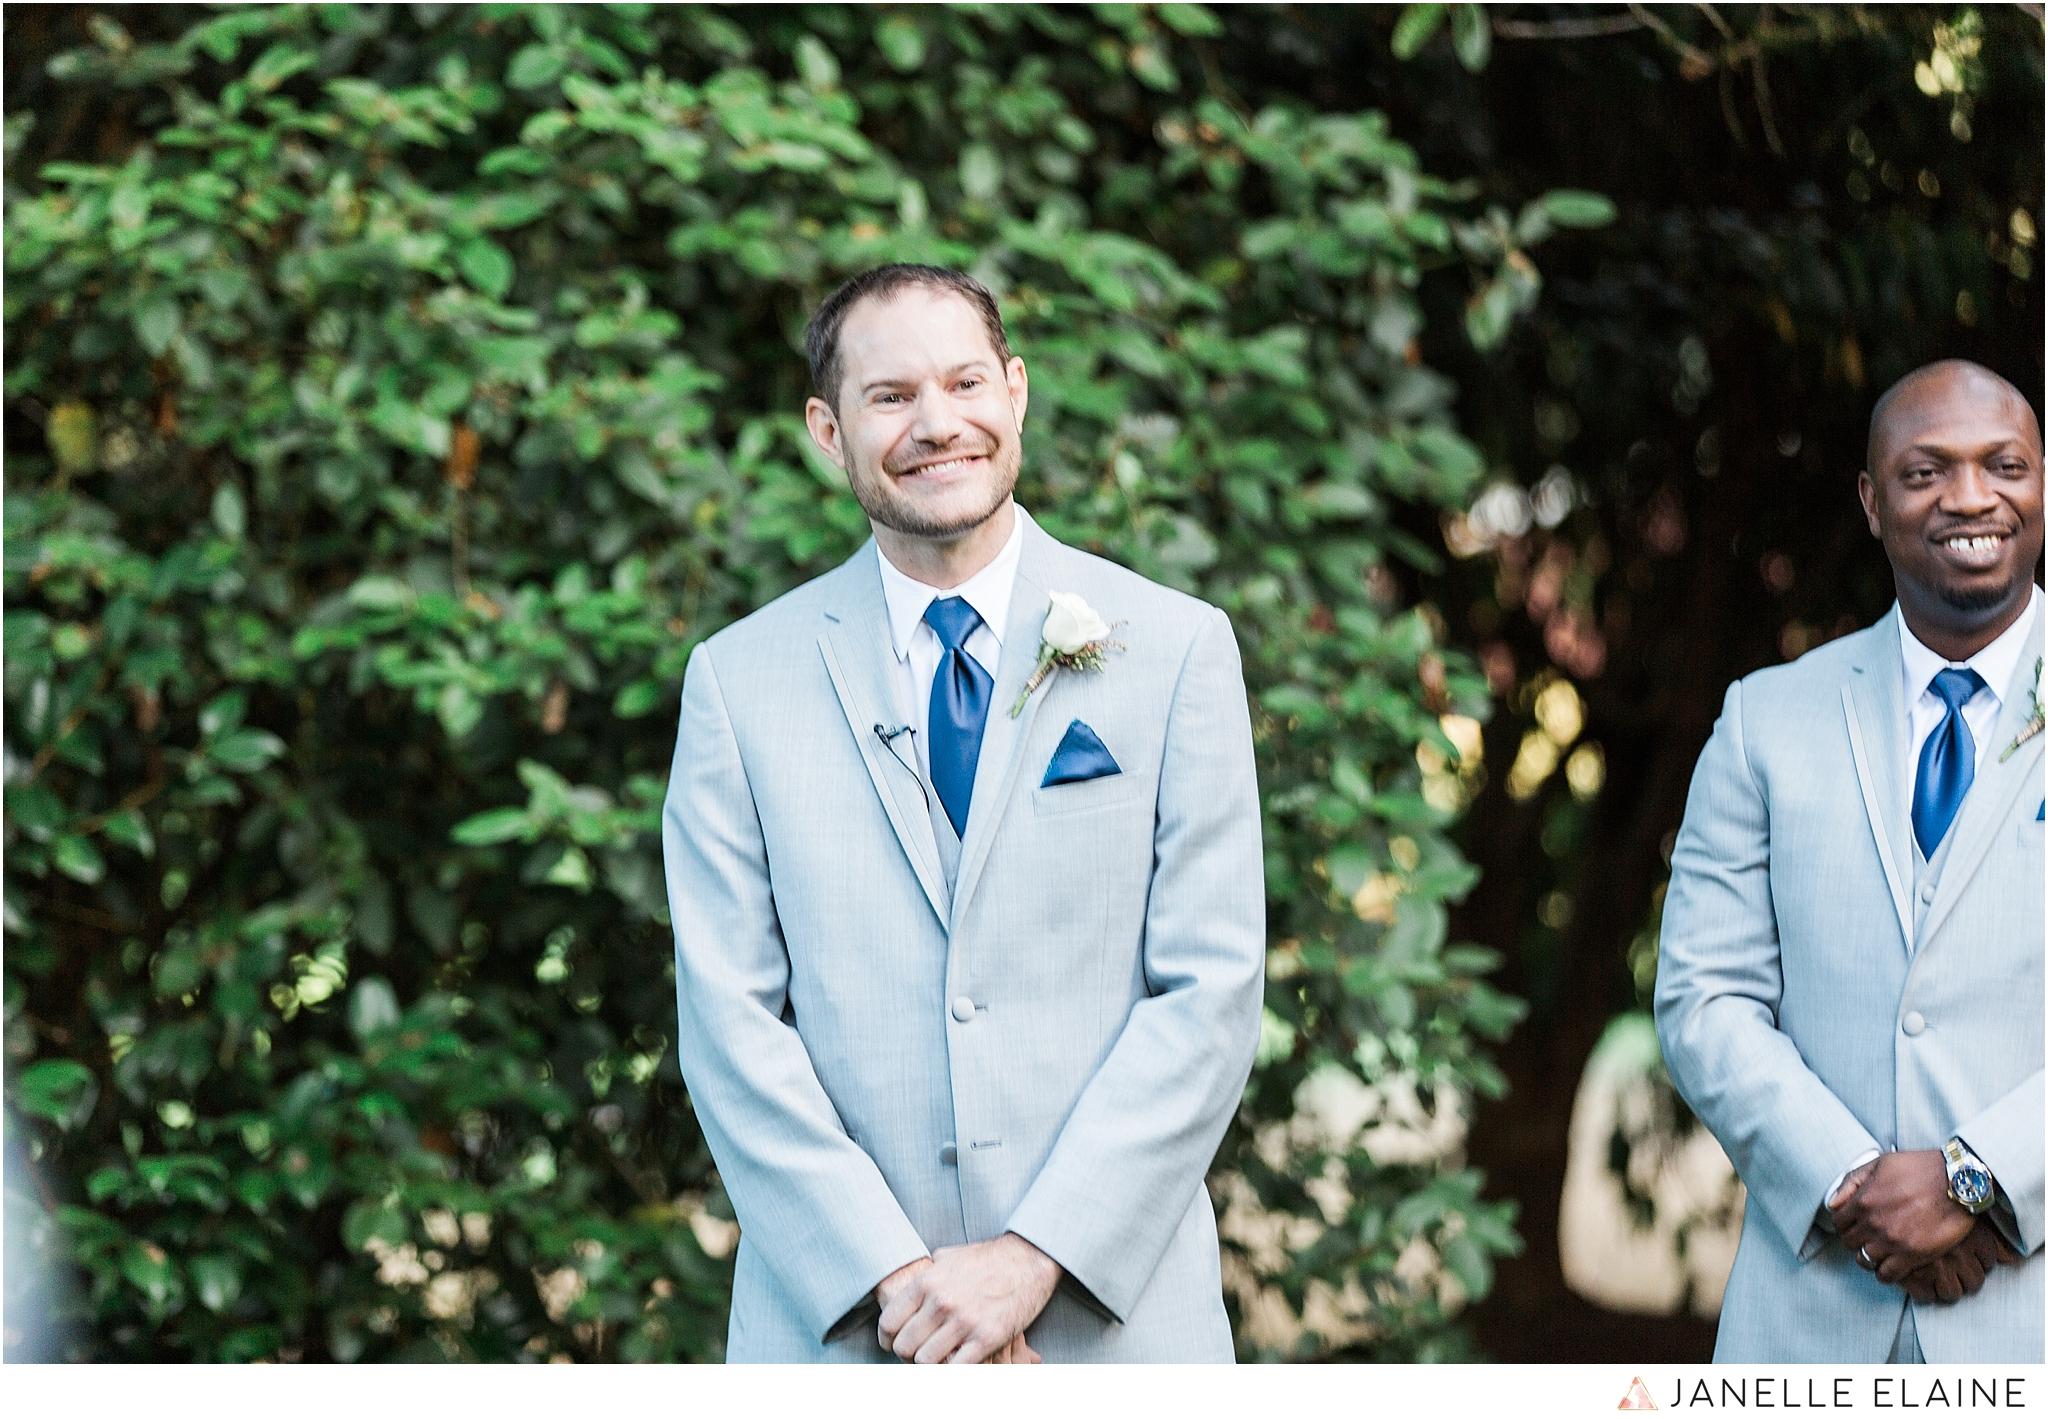 janelle elaine photography-professional wedding photographer-seattle-bellevue-robinswood house-135.jpg